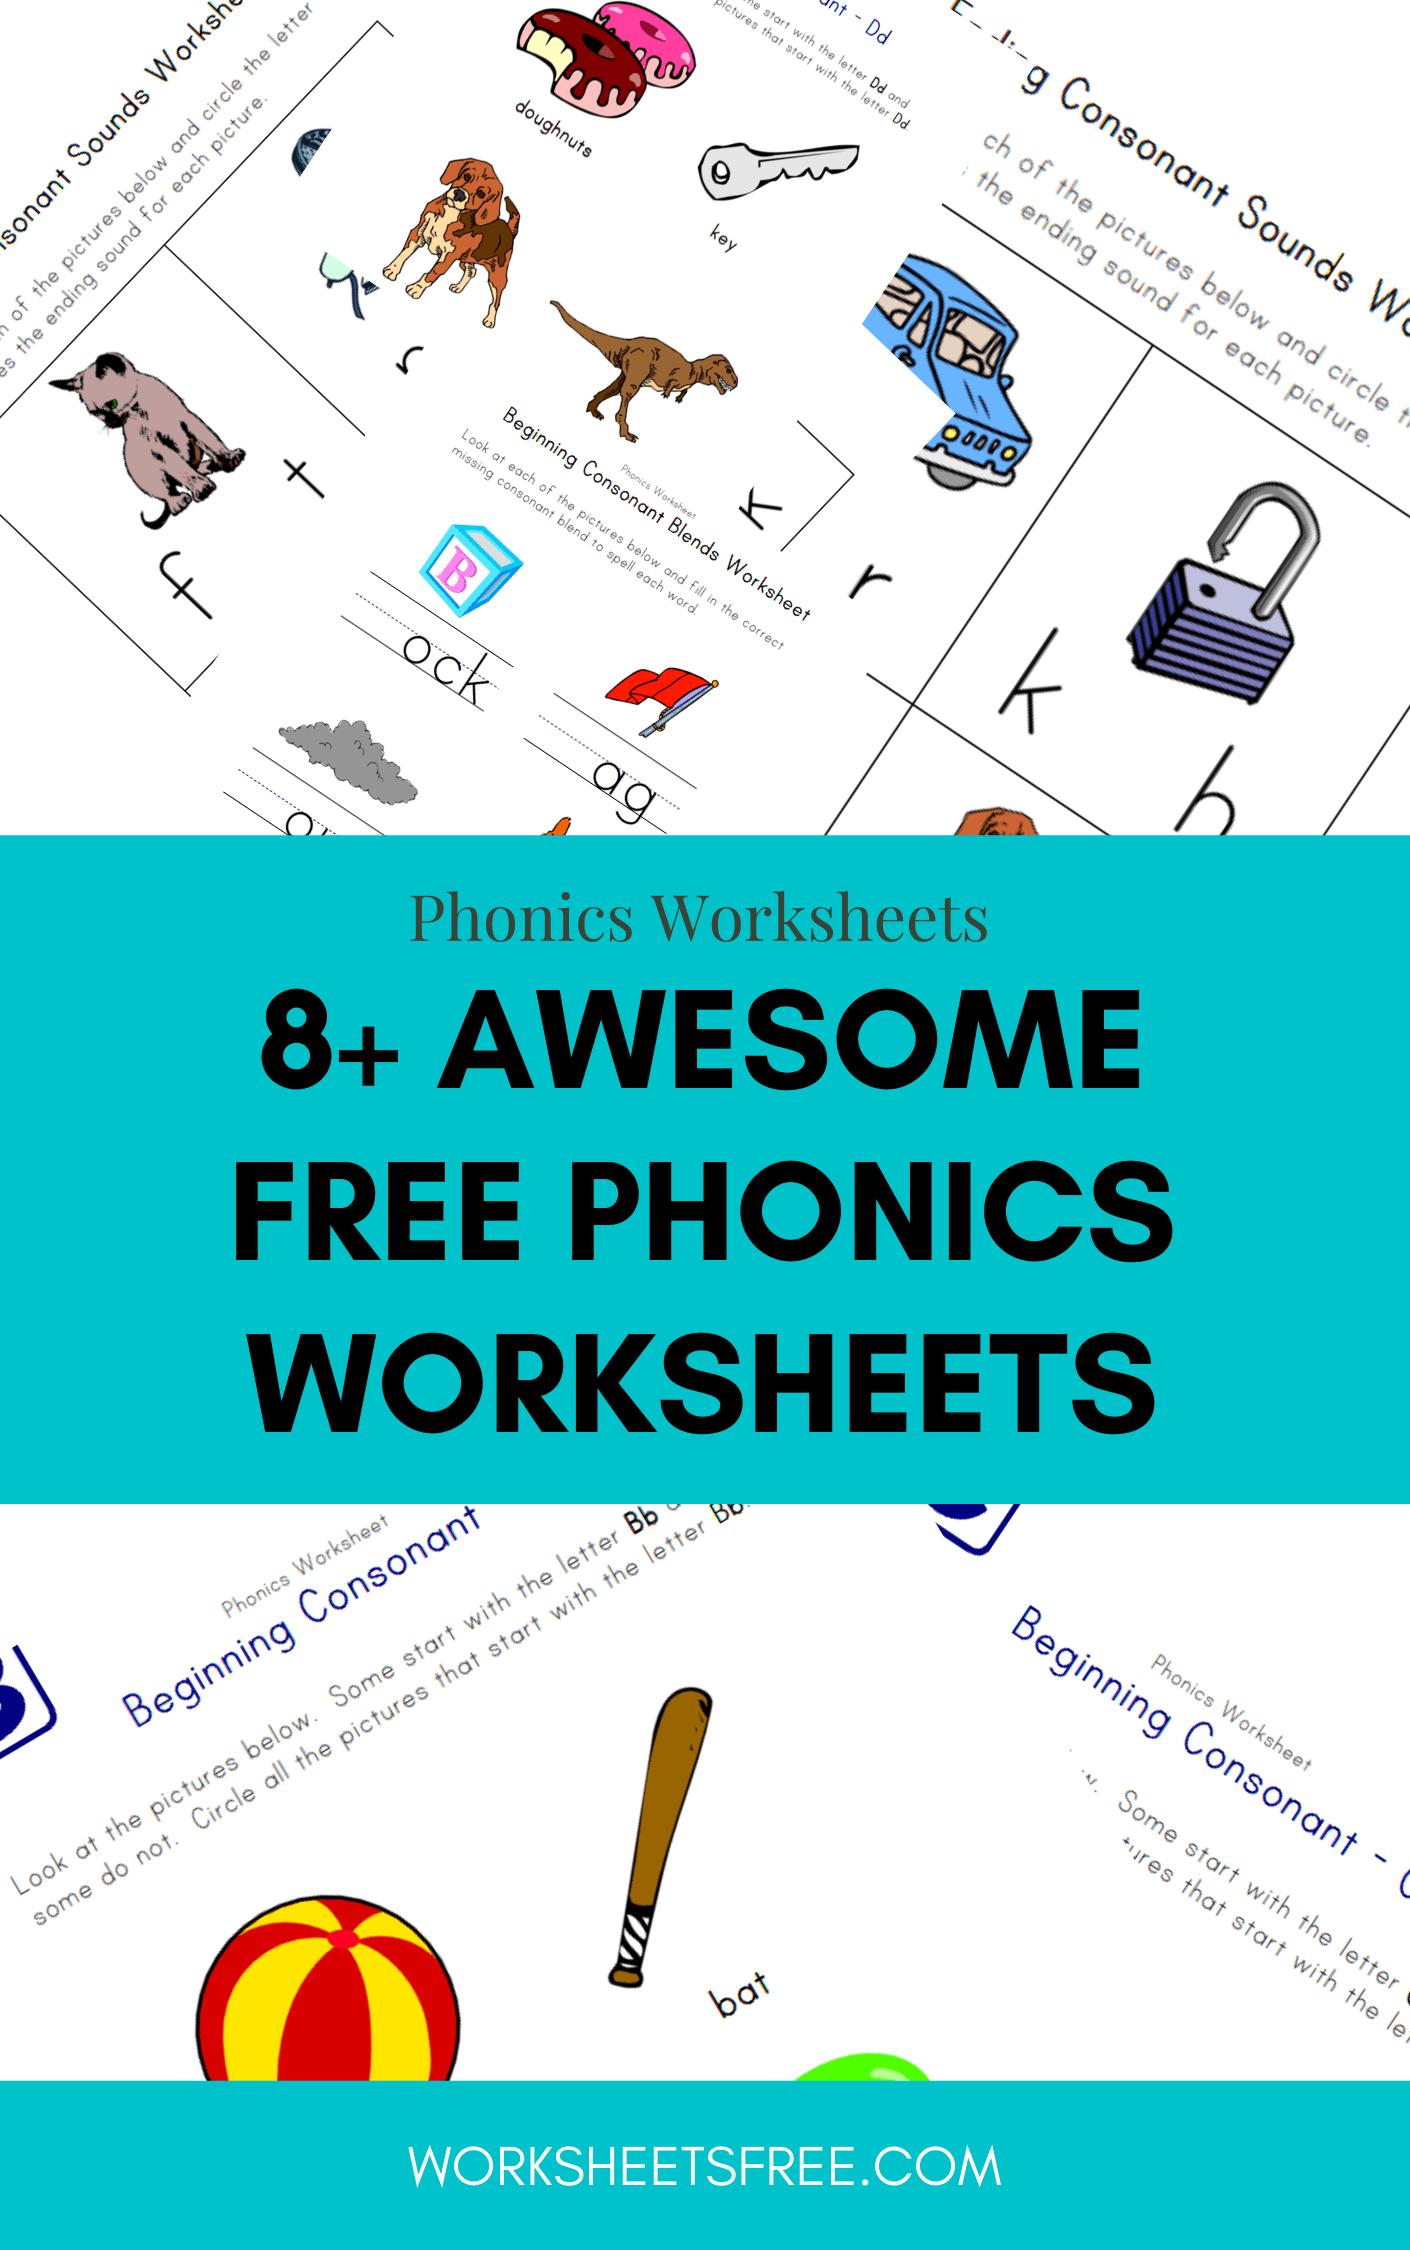 8 Awesome Free Phonics Worksheets